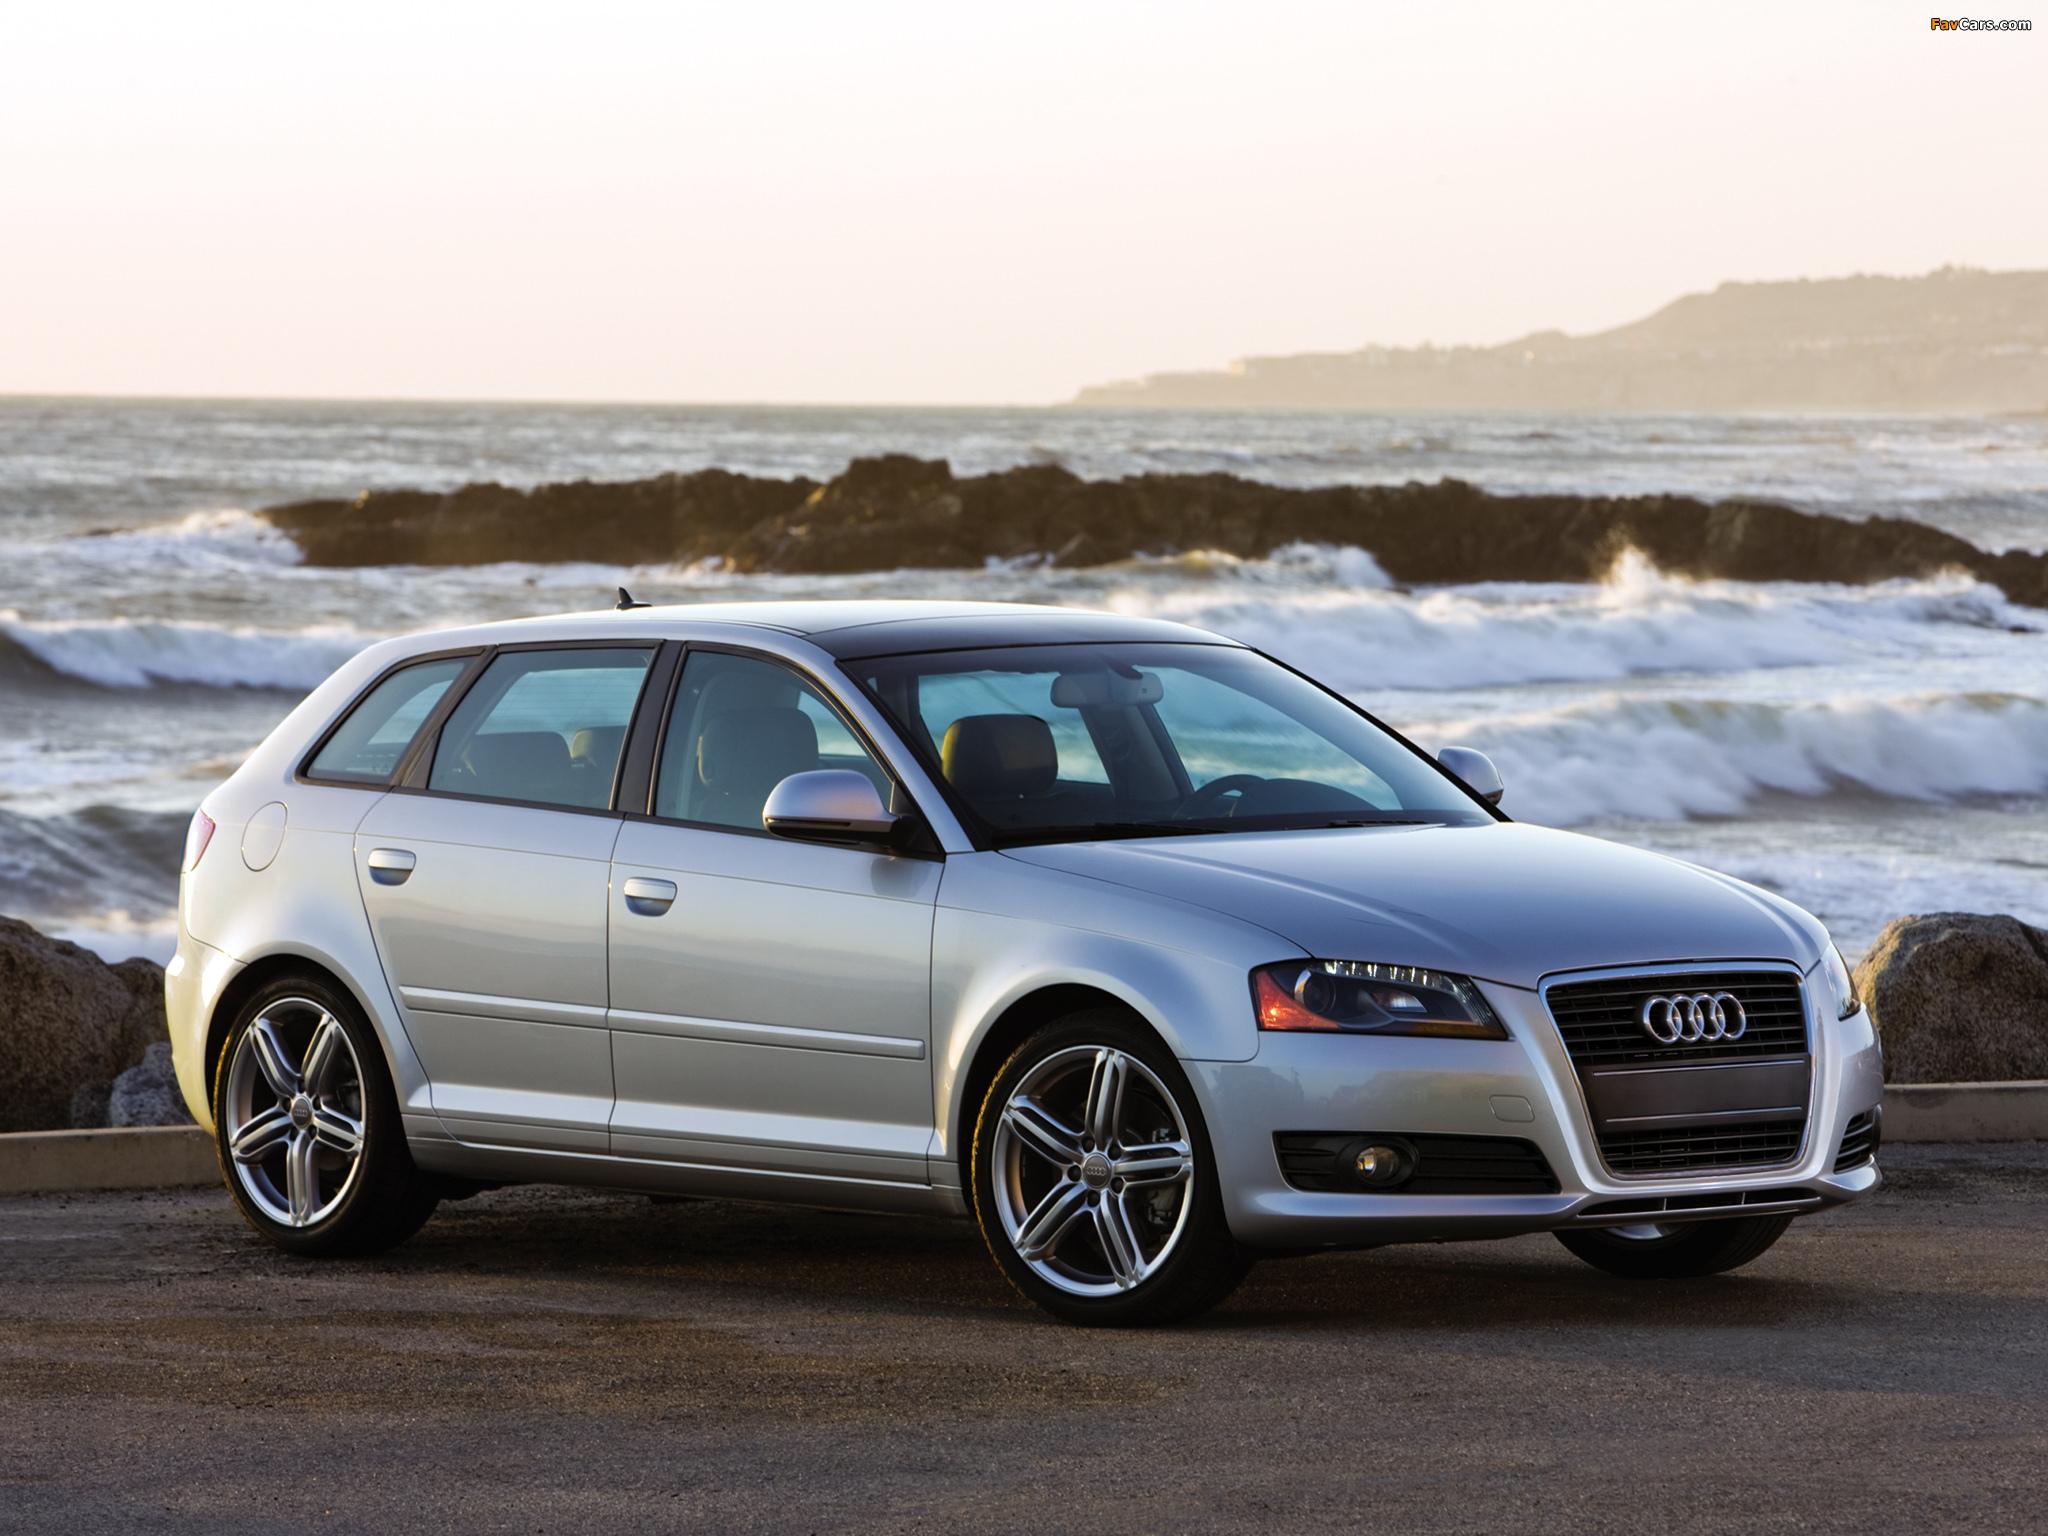 2008 Audi A3 Image 20